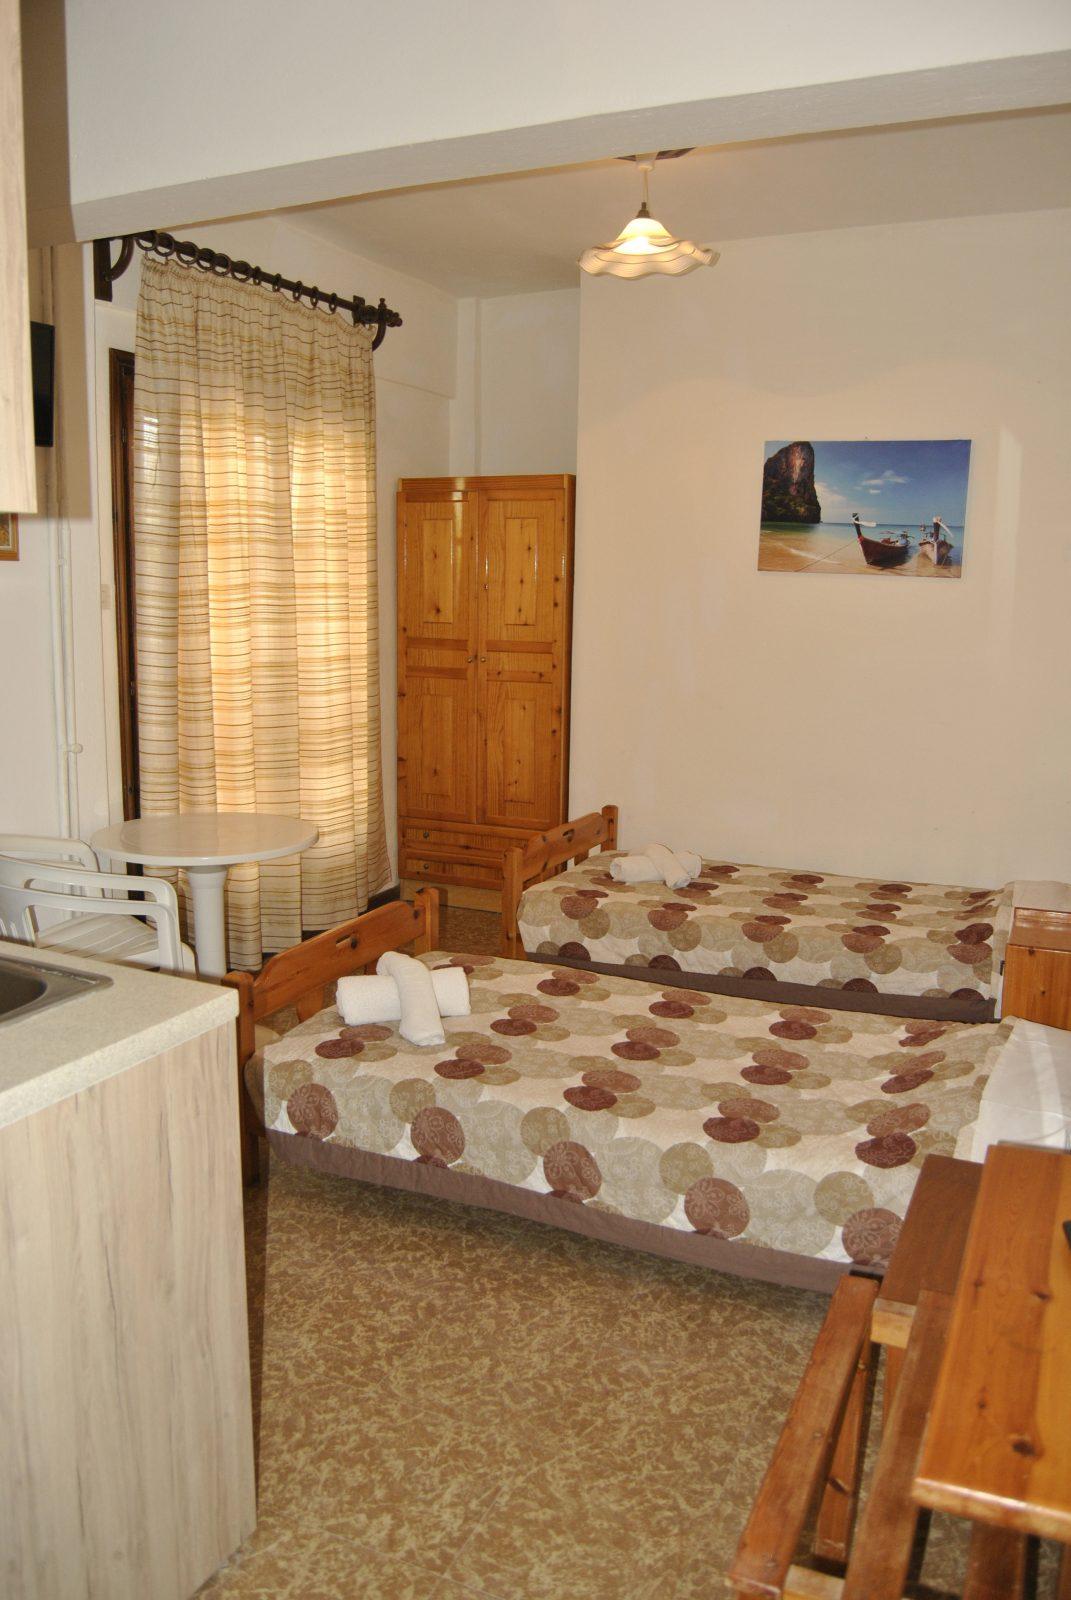 Grcka apartmani letovanje, Nea Flogita Halkidiki, Pirgioti, kuhinja